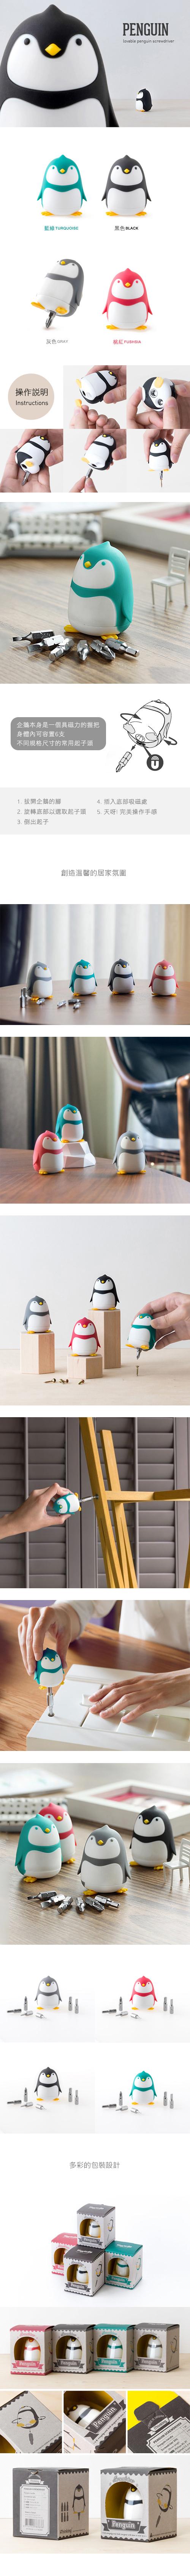 iThinking 企鵝螺絲起子組 (6入) 黑